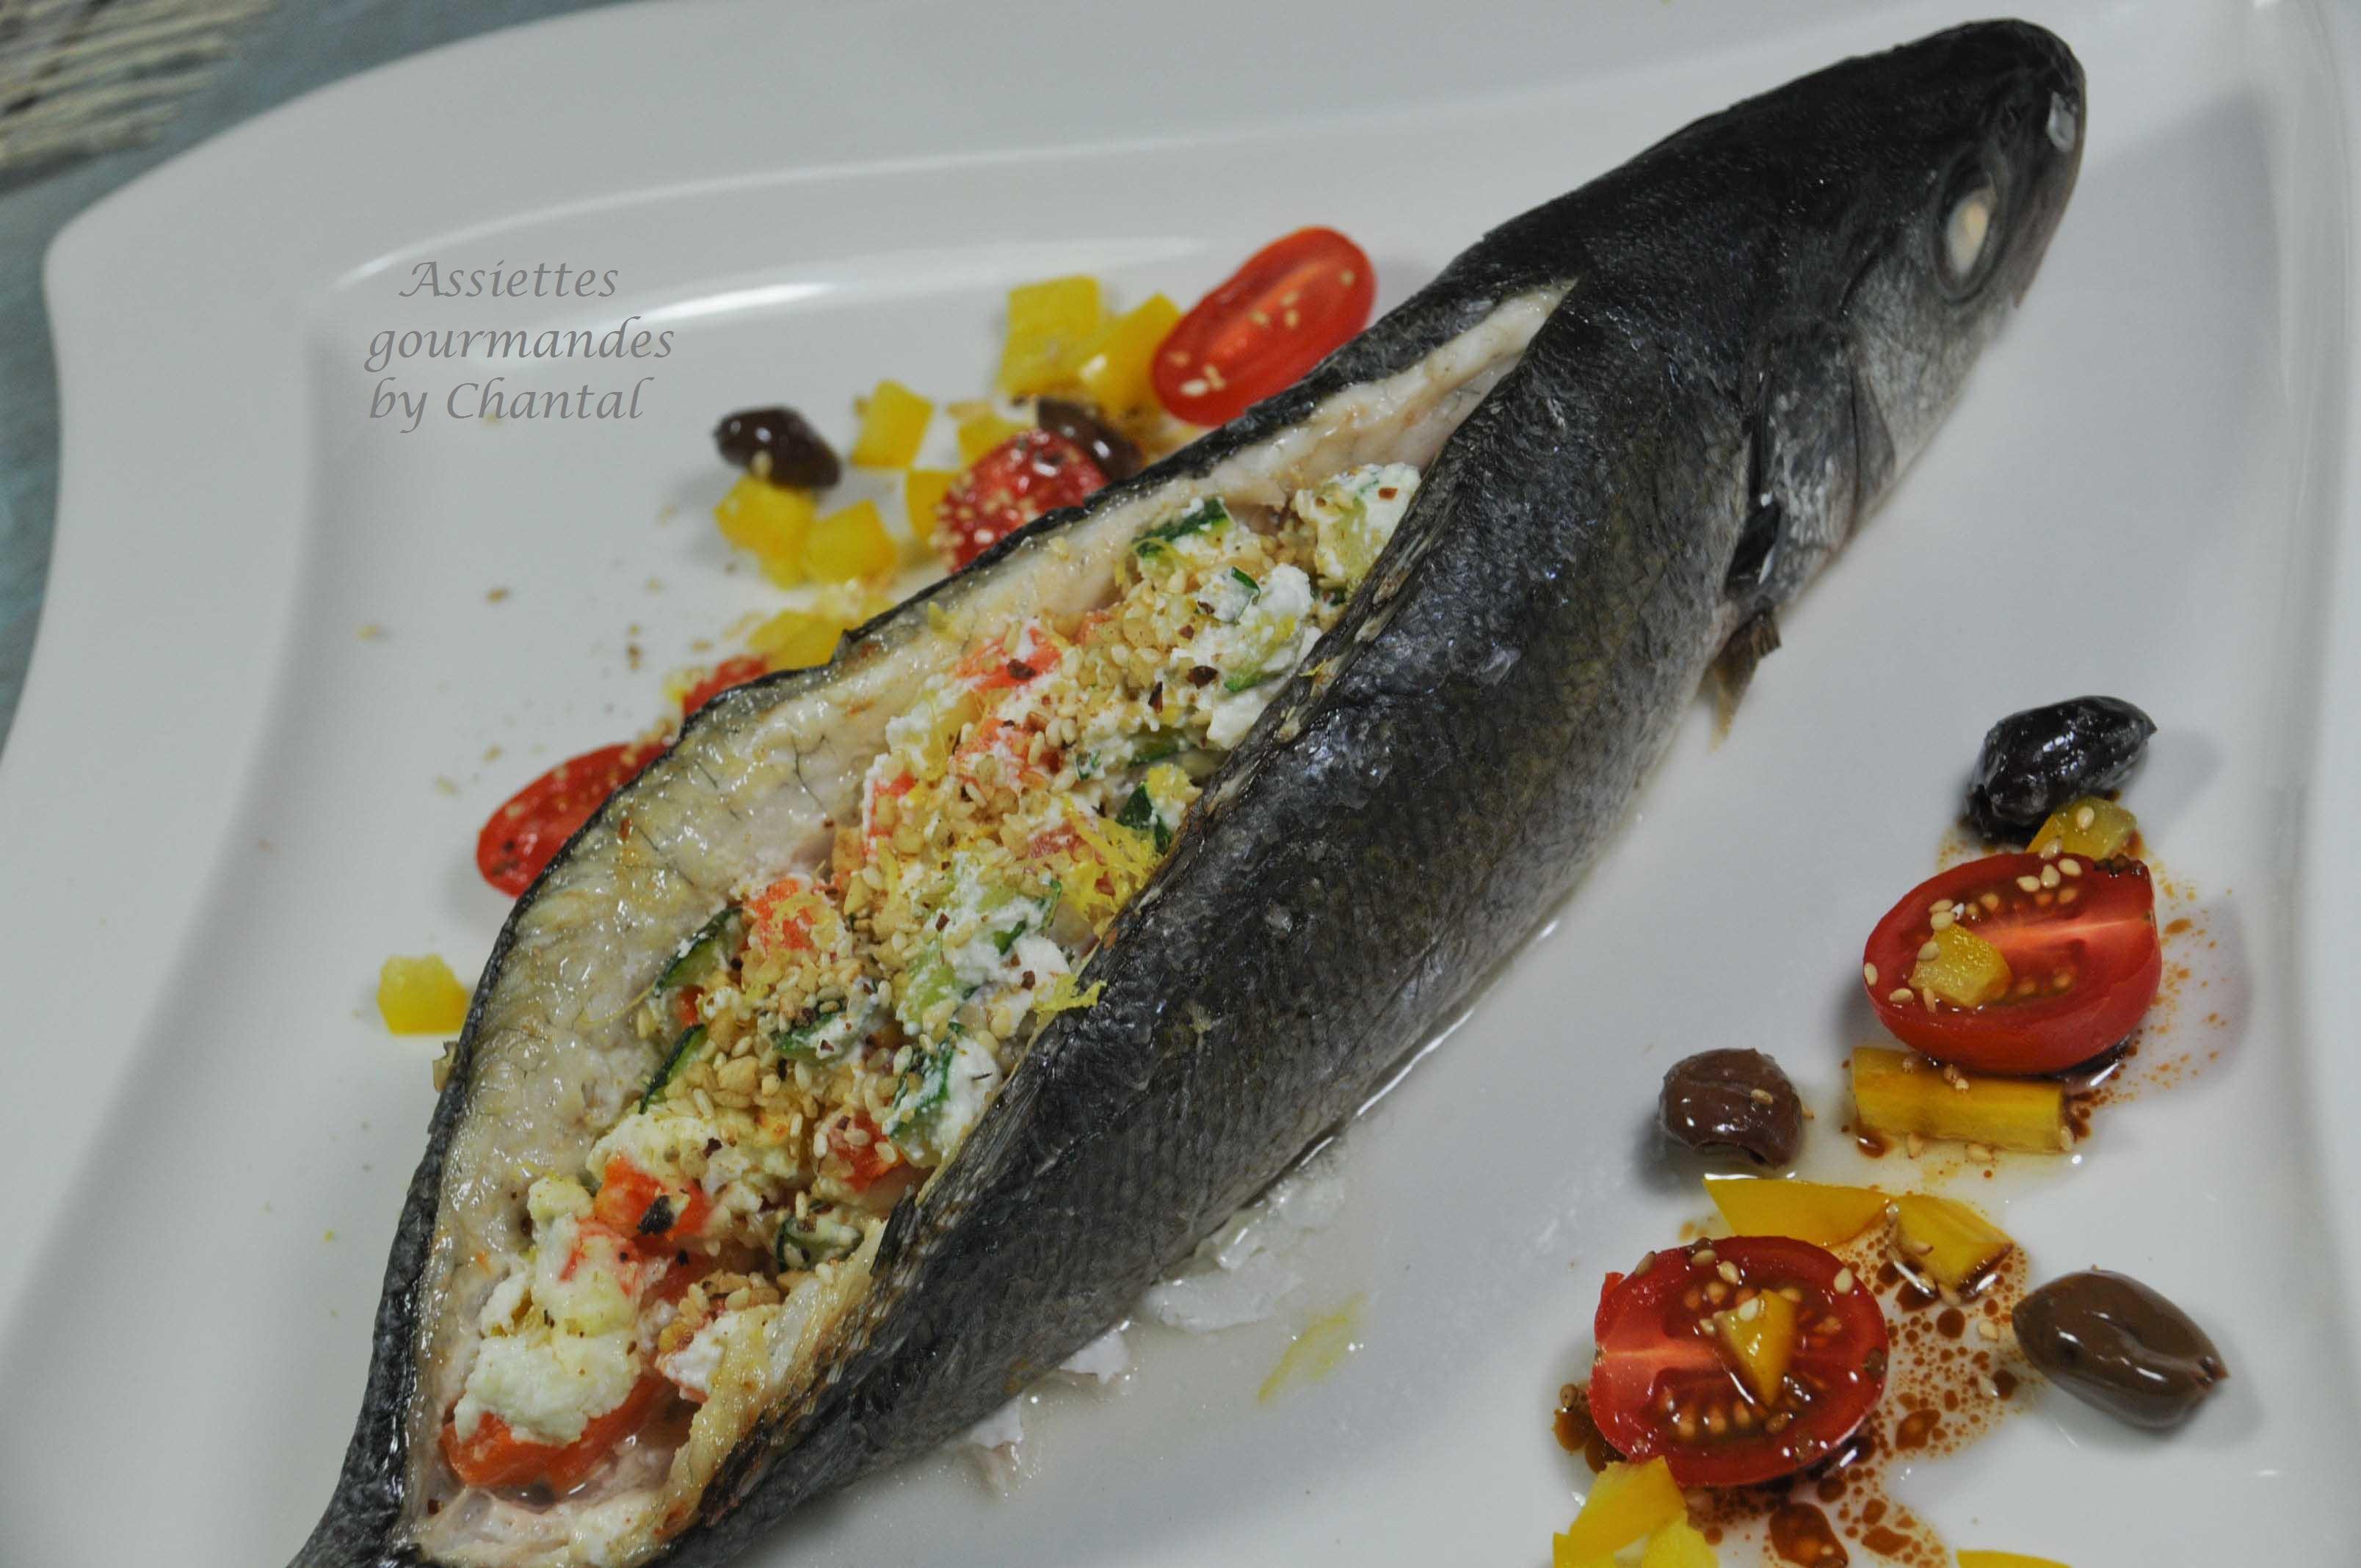 Cuisine Moleculaire Ingredients